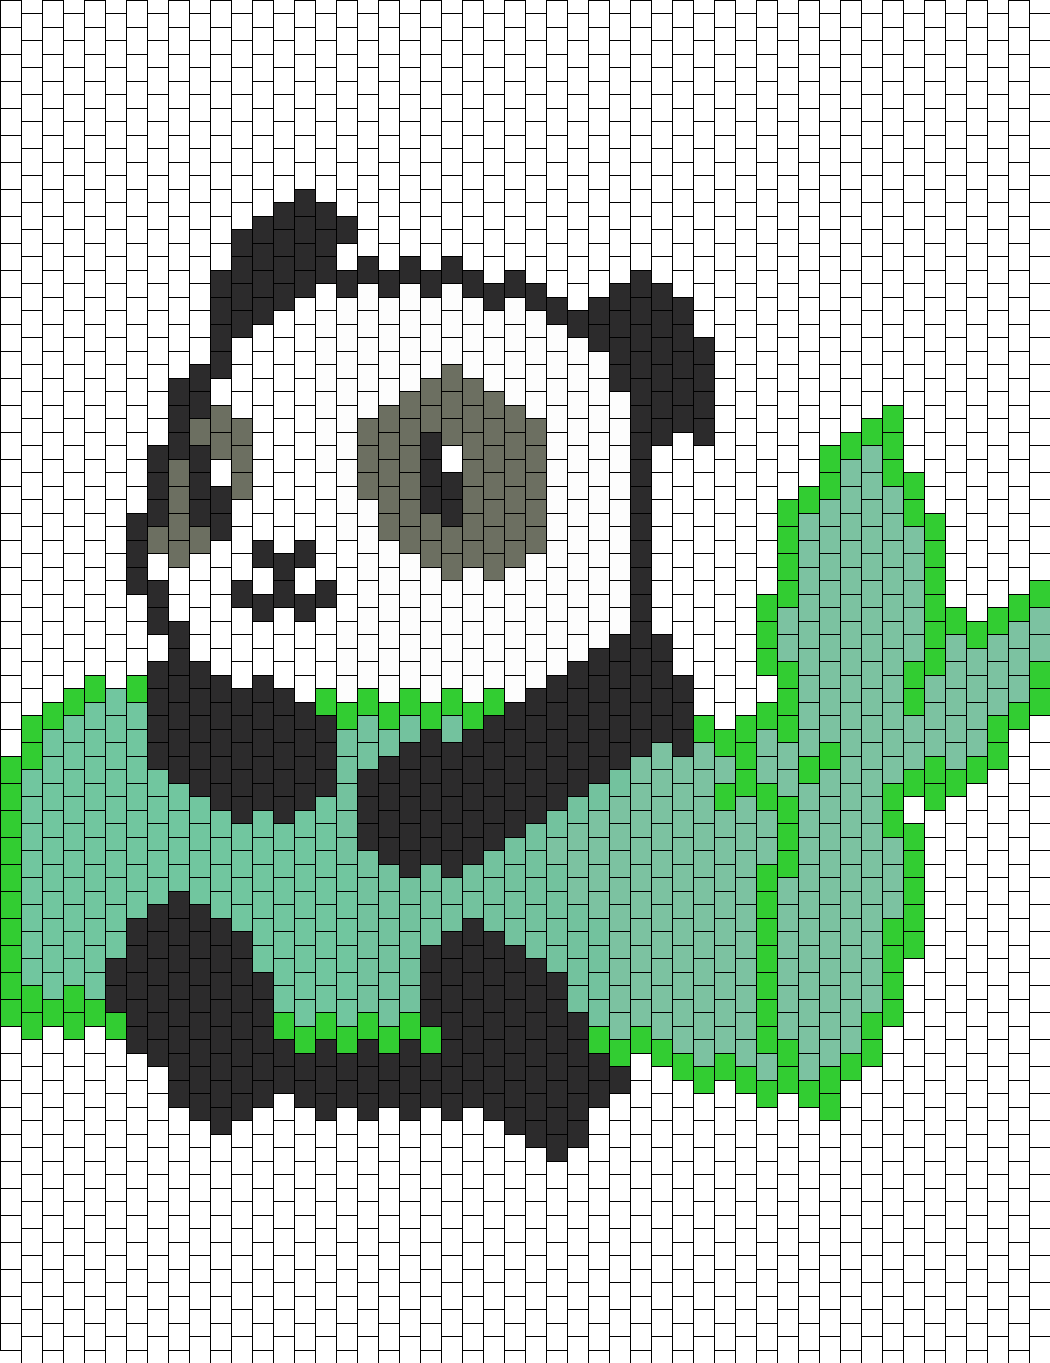 Panda Holding Bamboo